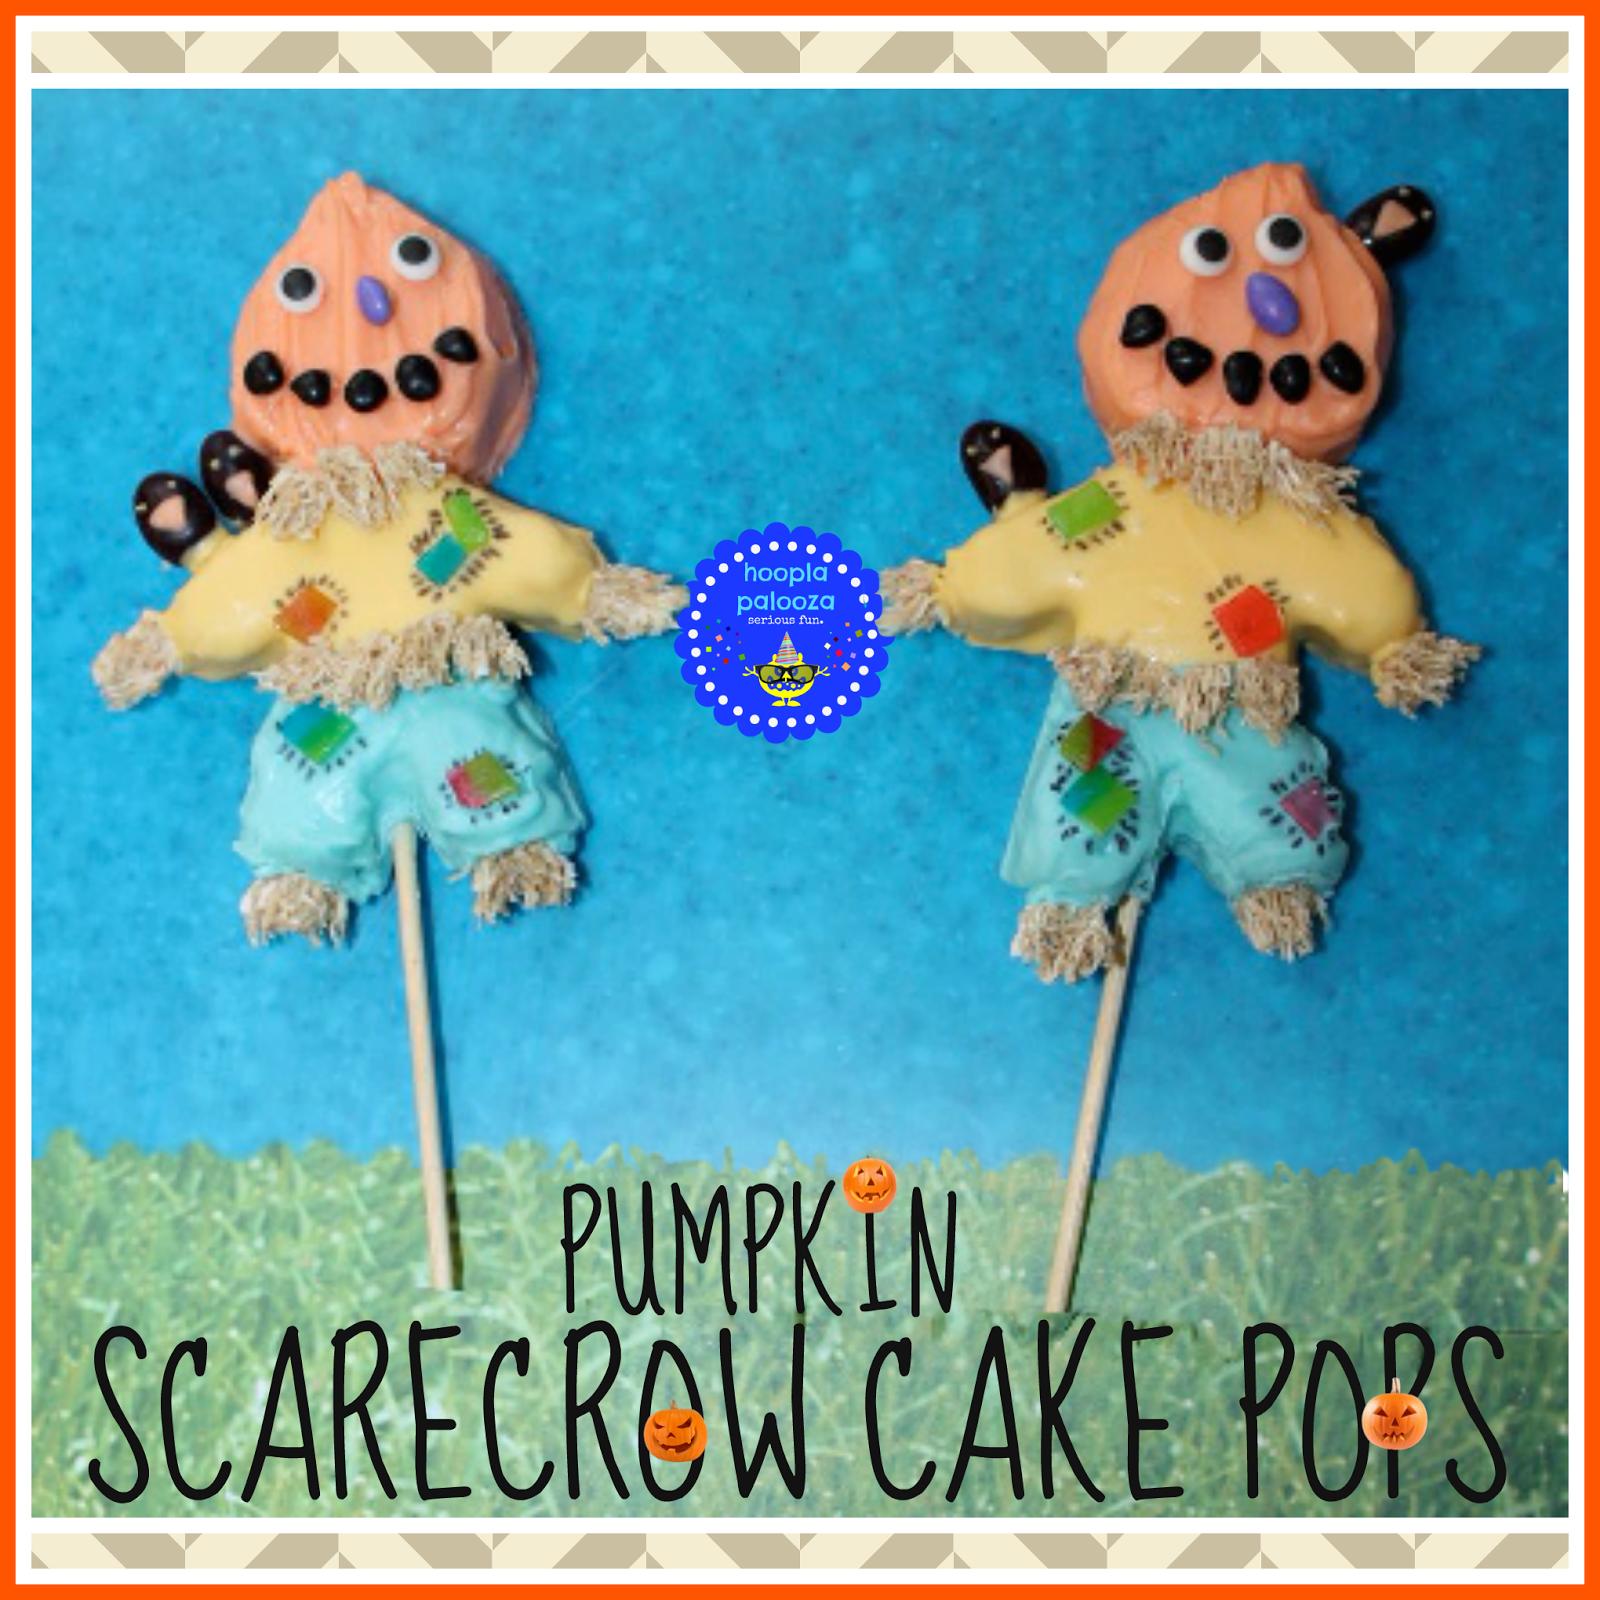 Scarecrow Cake Pops